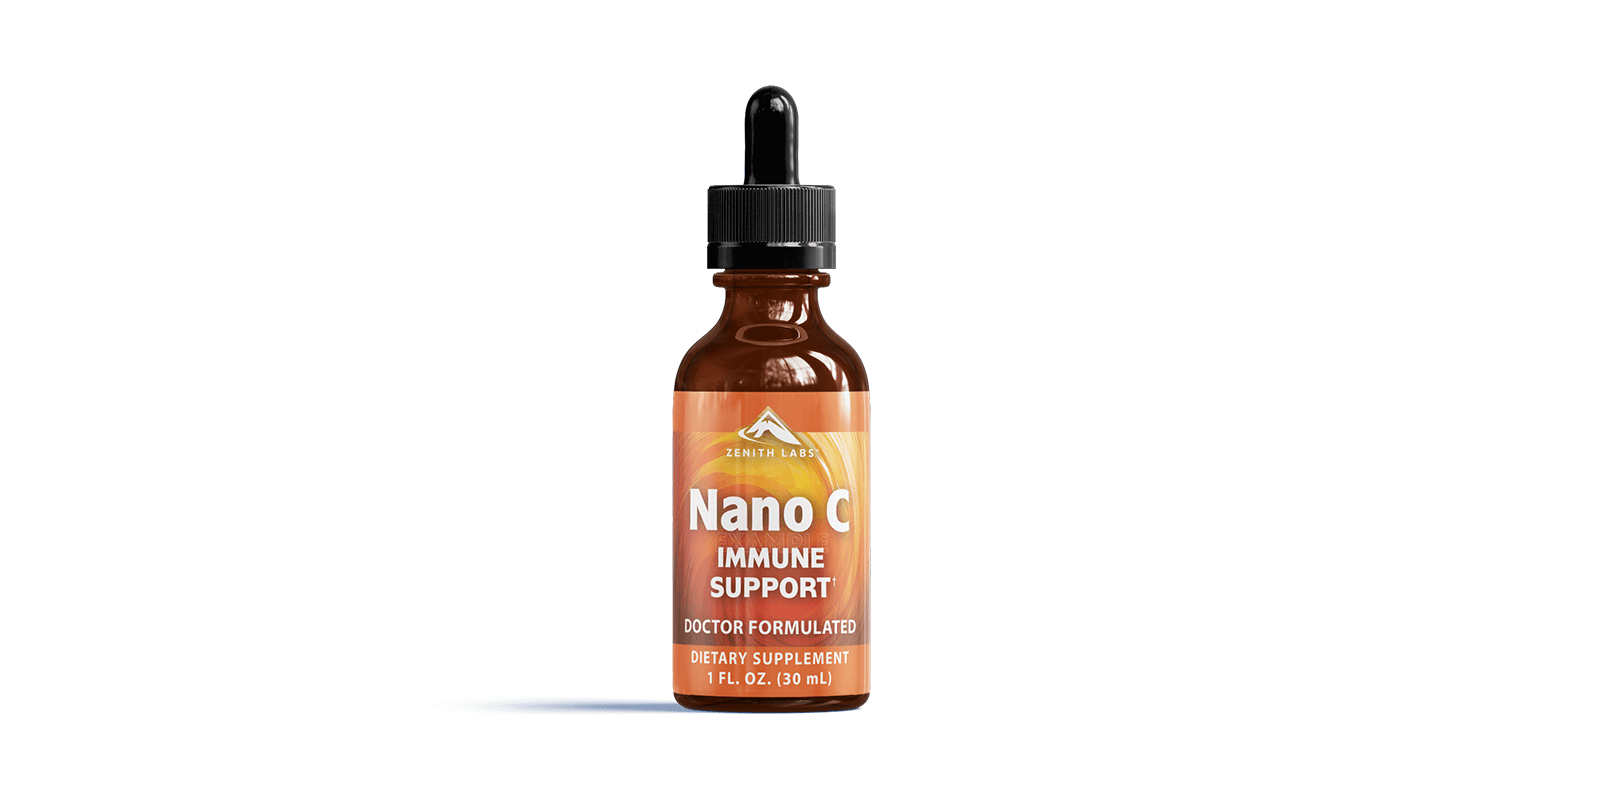 Nano C Immune Support review